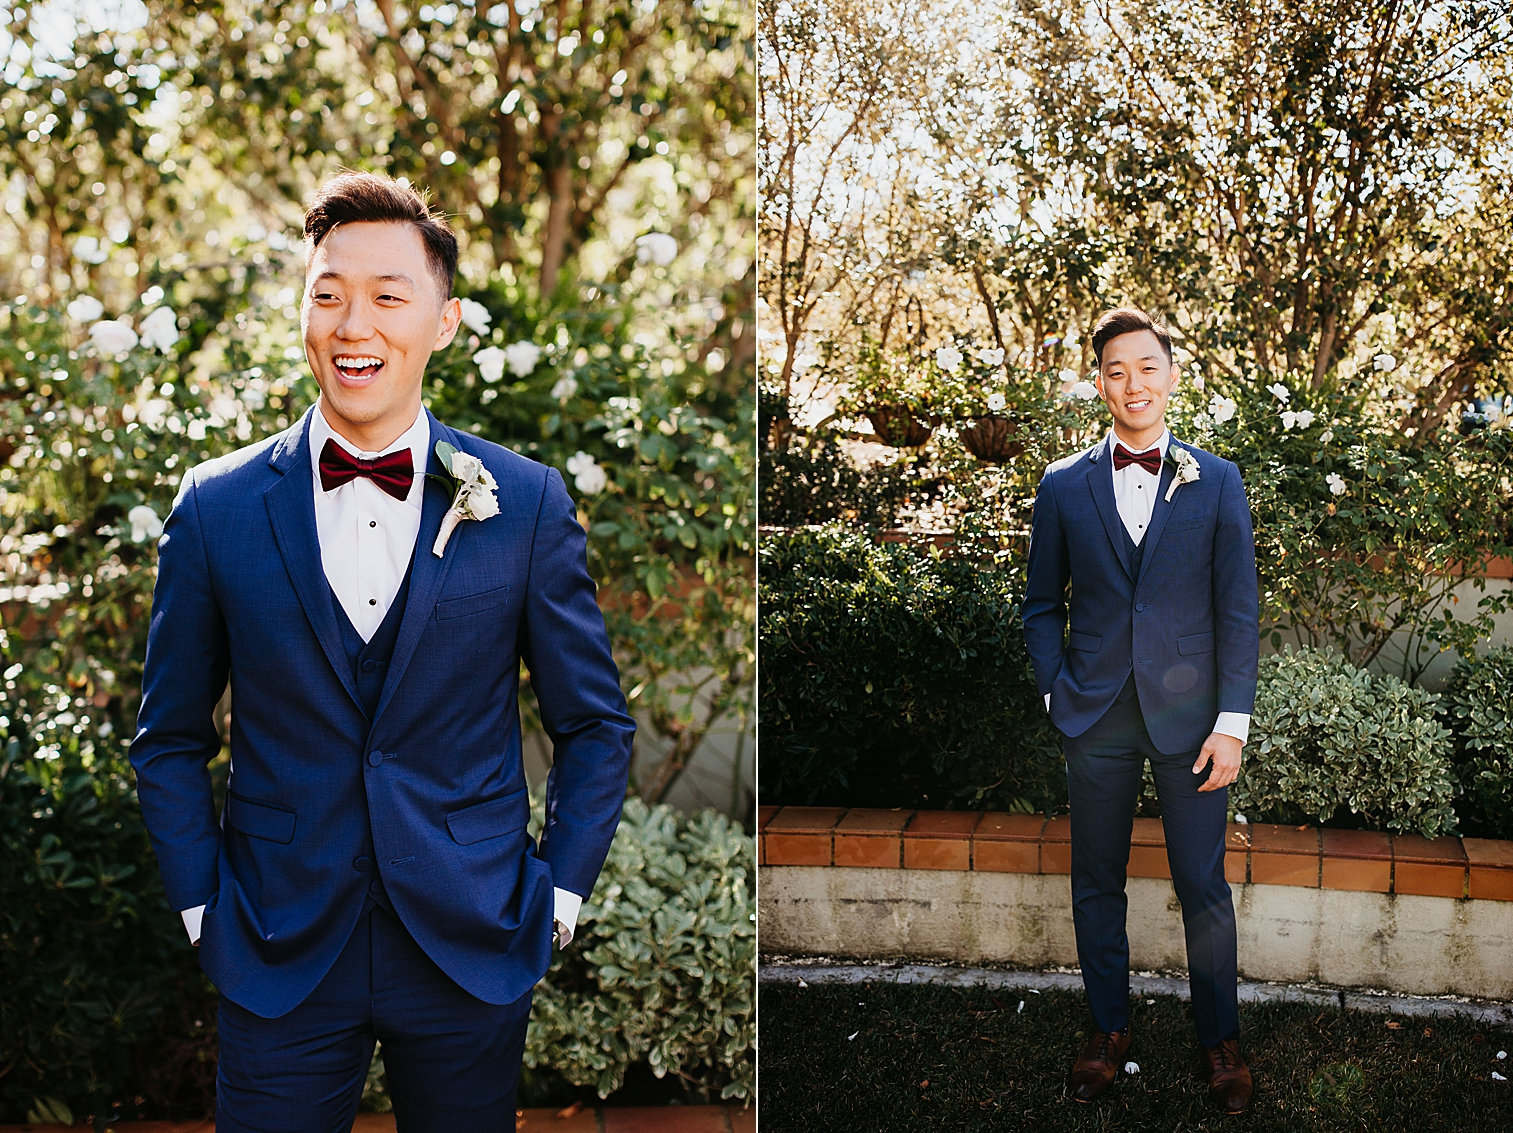 Secret-Garden-Rancho-Santa-Fe-Wedding-34.jpg